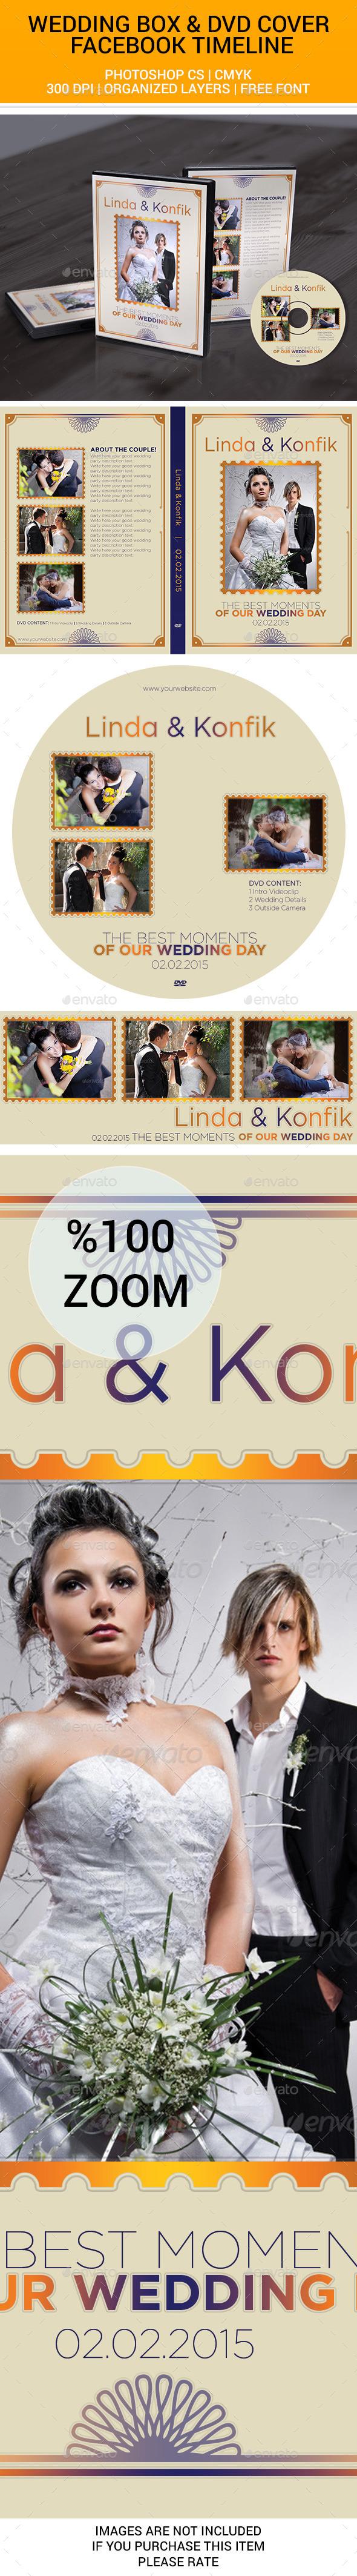 Wedding DVD Cover & CD Label v11 - CD & DVD Artwork Print Templates